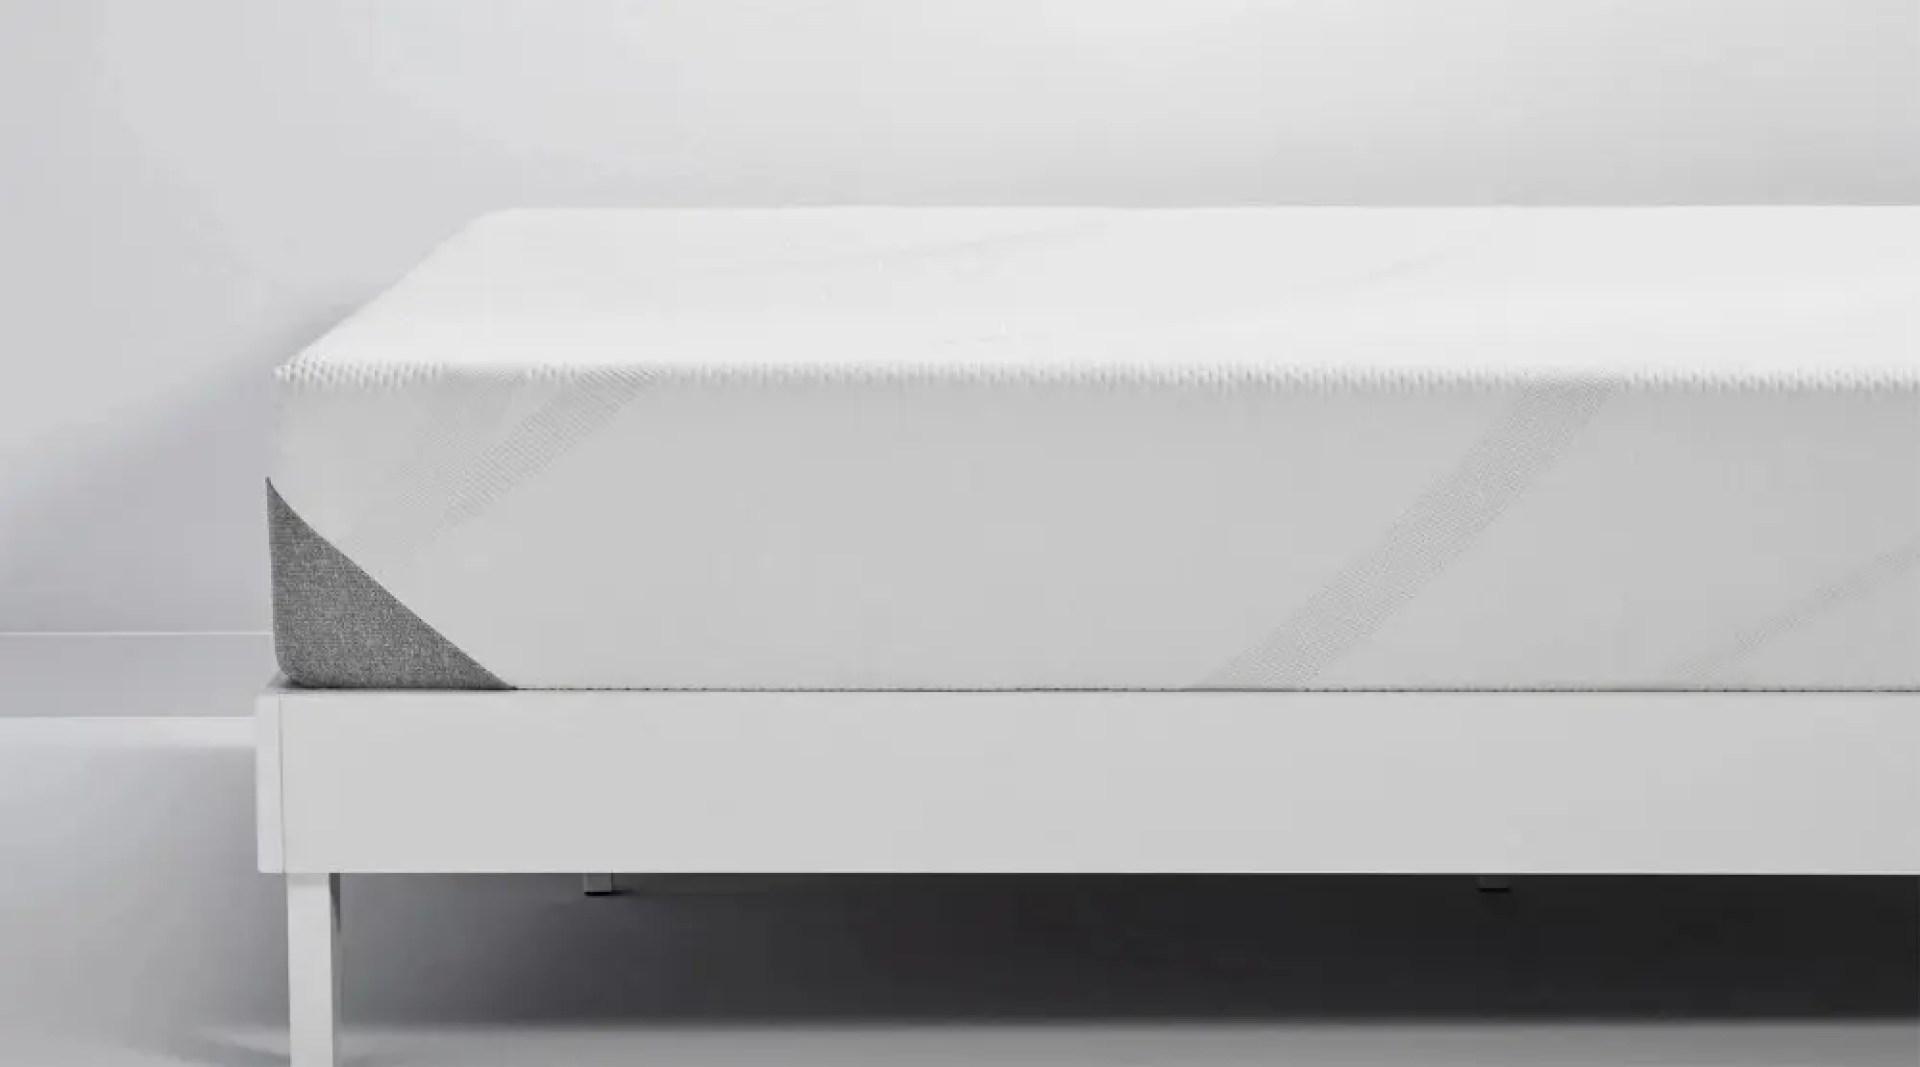 A side view of the Tempur-Cloud mattress